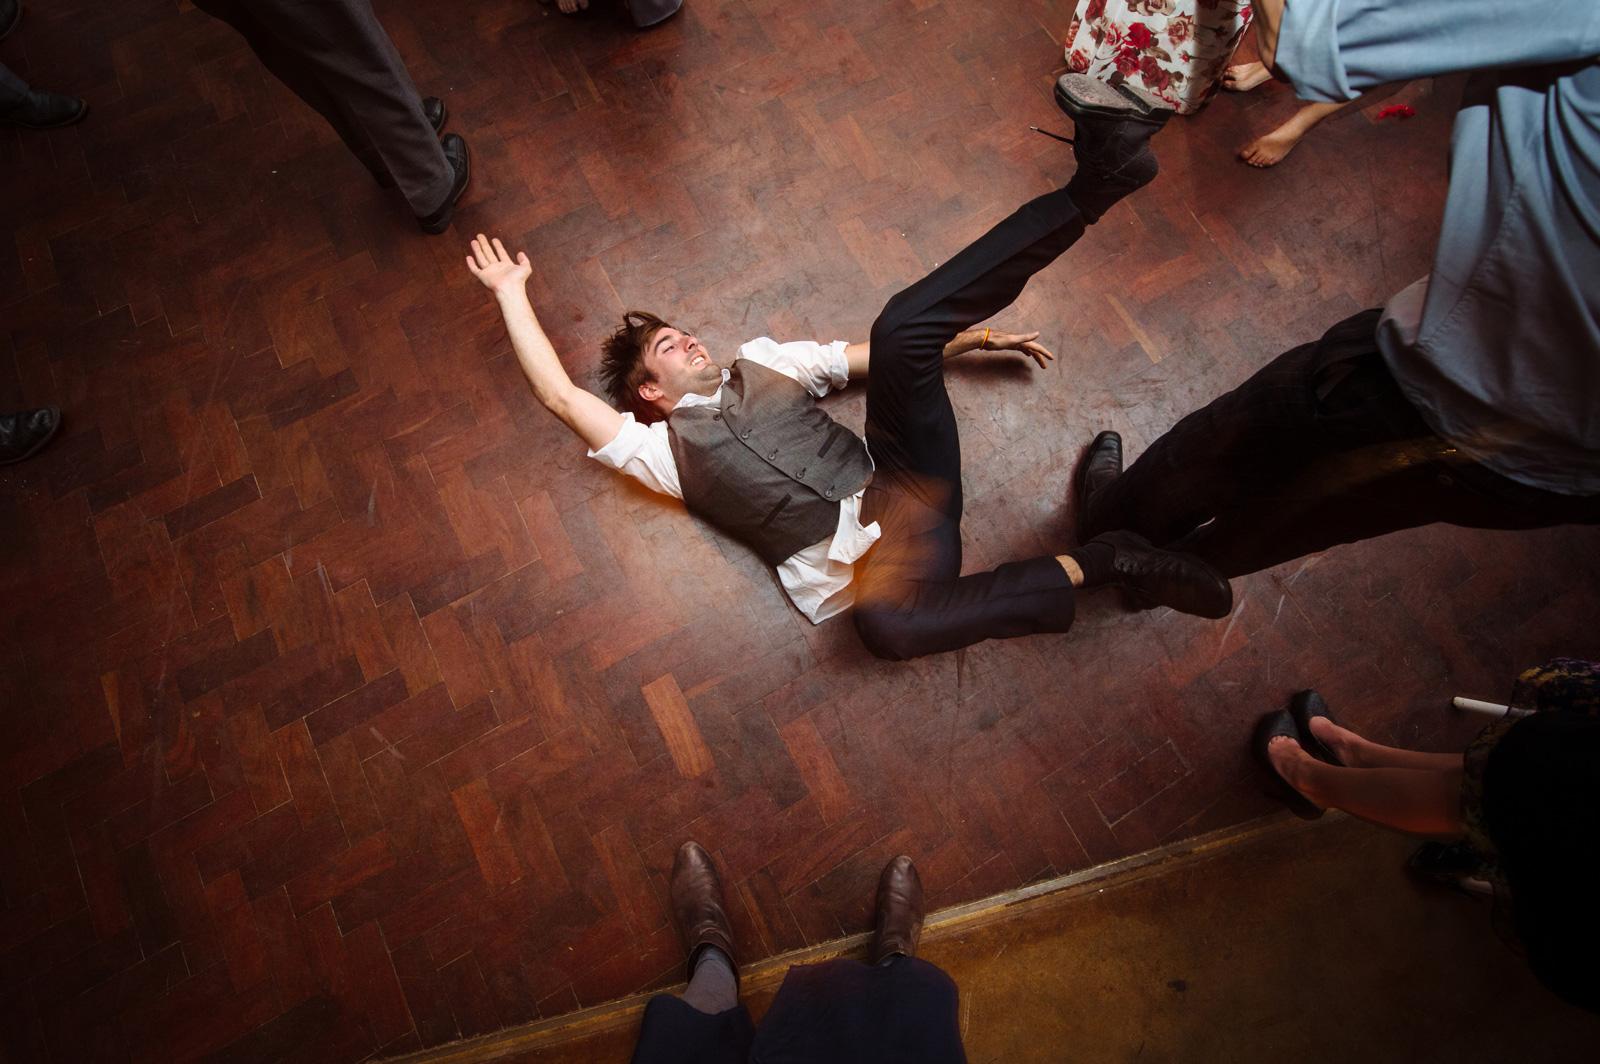 man fallling while dancing